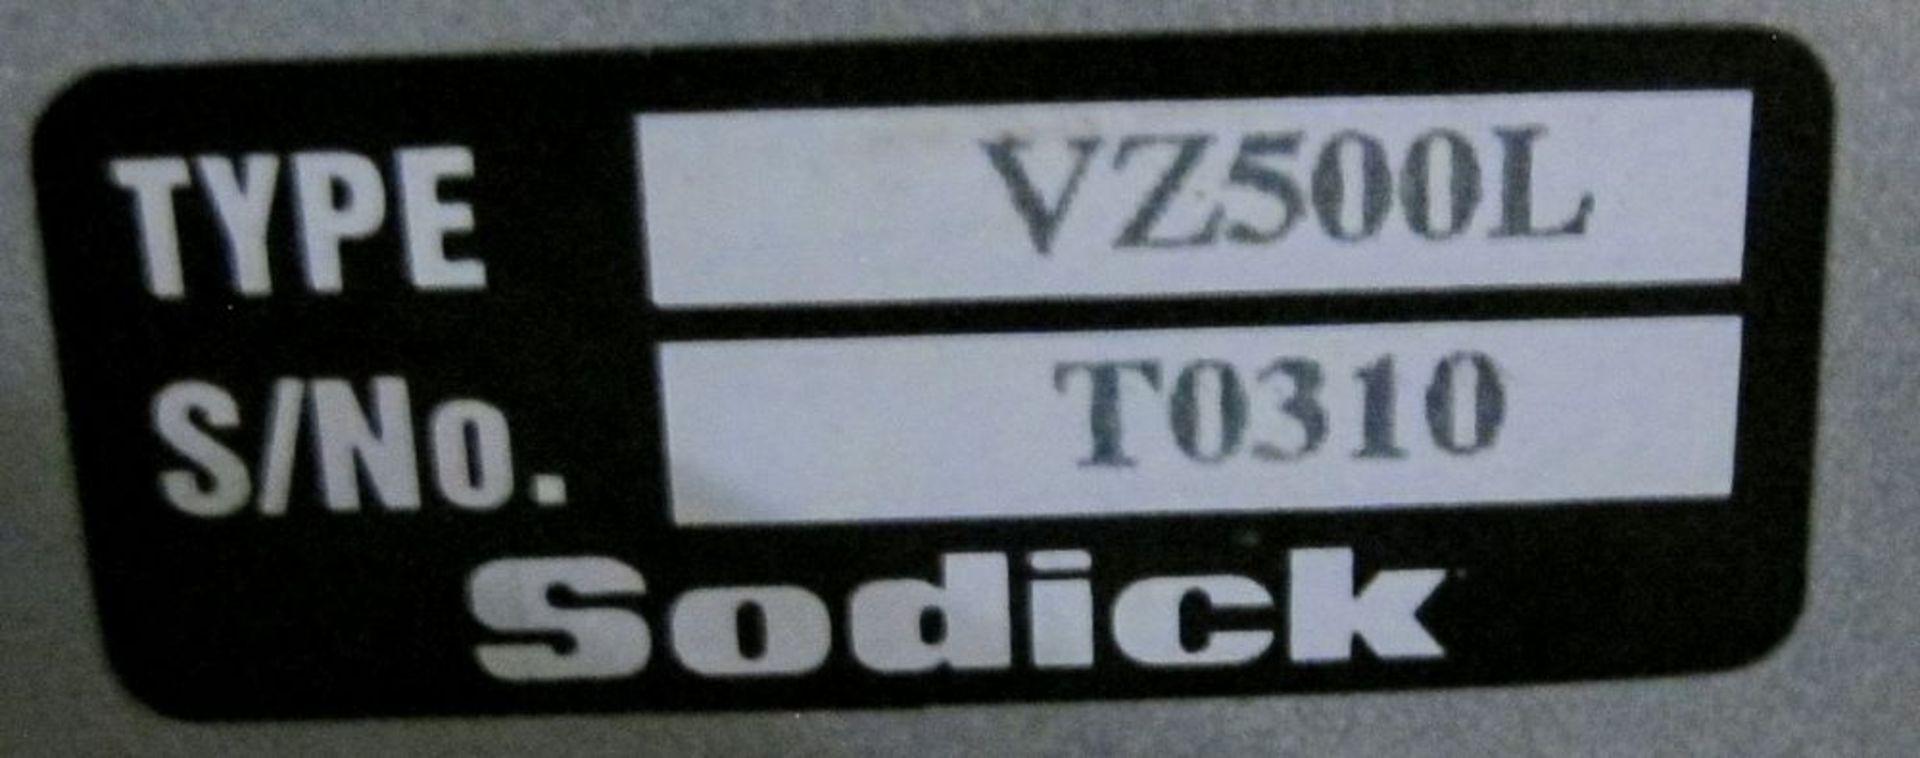 Lot 71 - 2016SODICKVZ500L Wire EDM, LN2W Control, s/n T0310, Travels: X-500mm, Y-350mm, Z-250mm